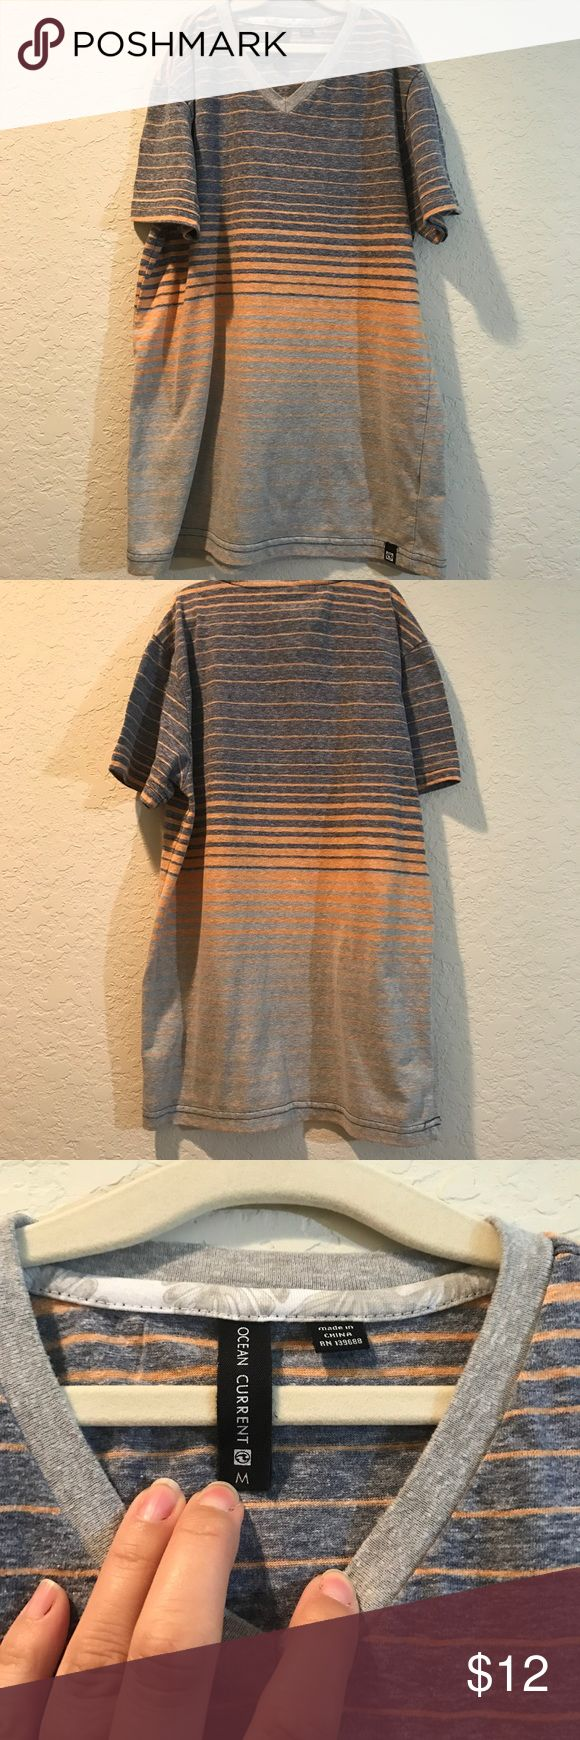 Ocean Current boys shirt Grey v-neck boys shirt with light orange strips. Ocean Current Shirts & Tops Tees - Short Sleeve